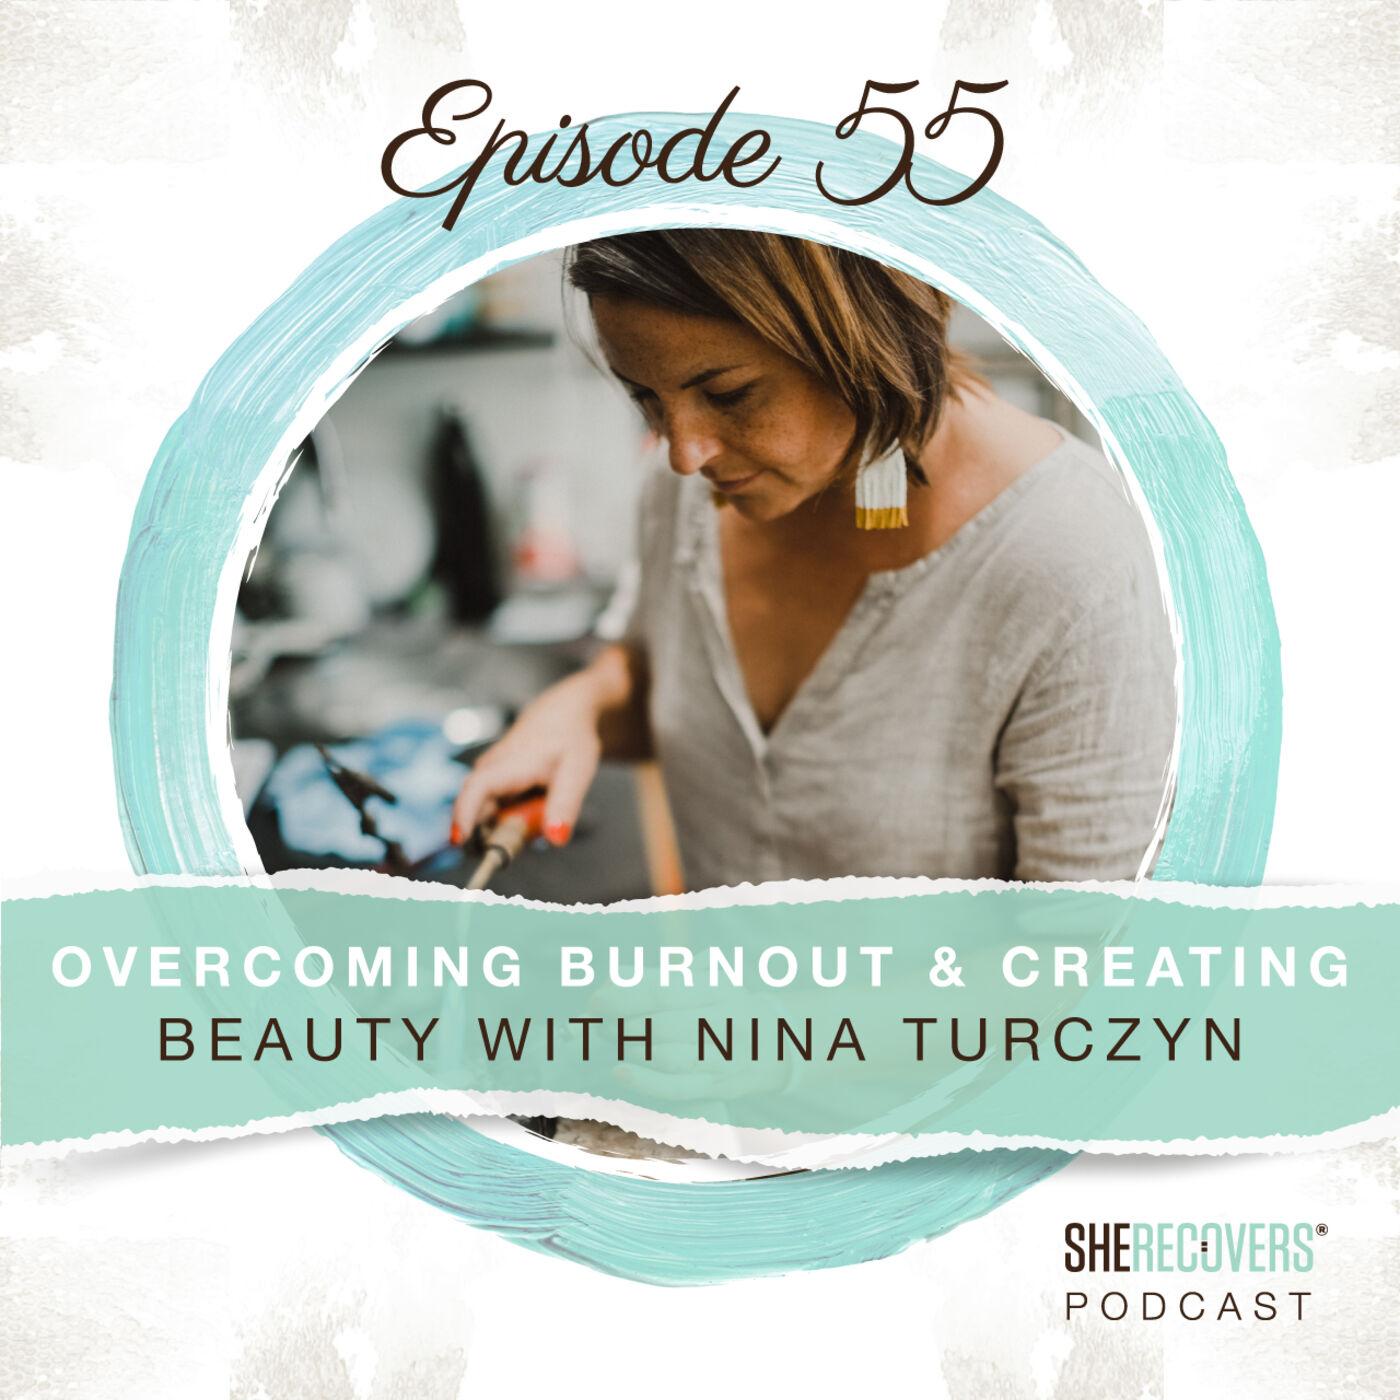 Episode 55: Overcoming Burnout & Creating Beauty with Nina Turczyn